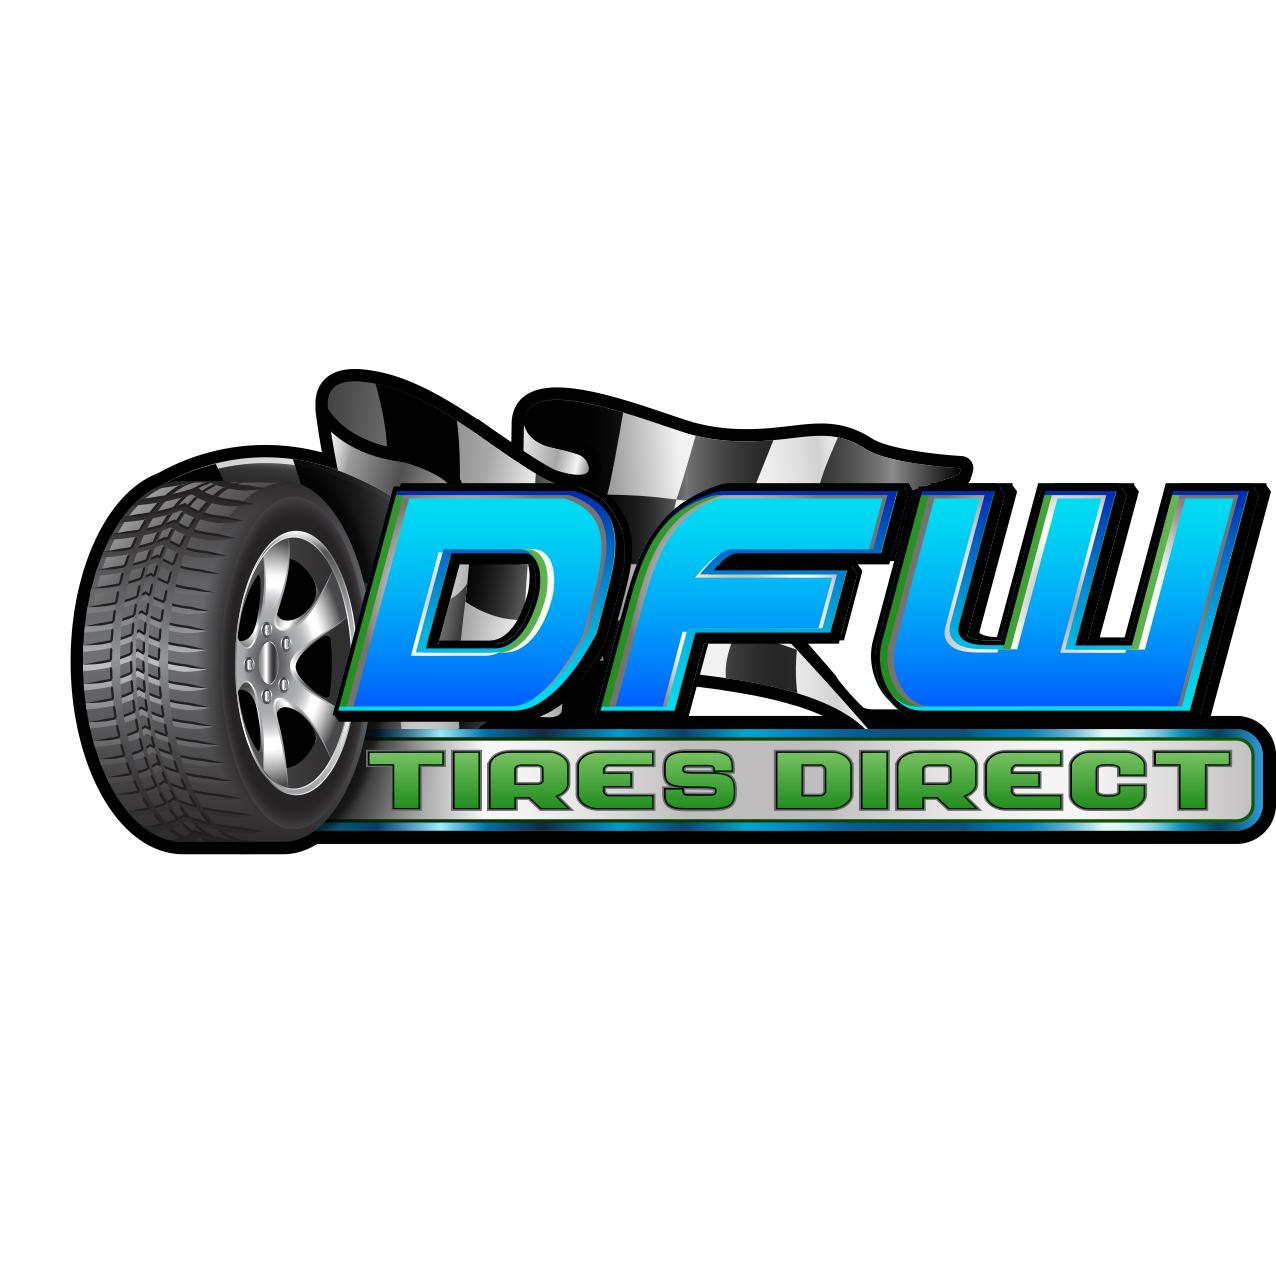 DFW Tires Direct